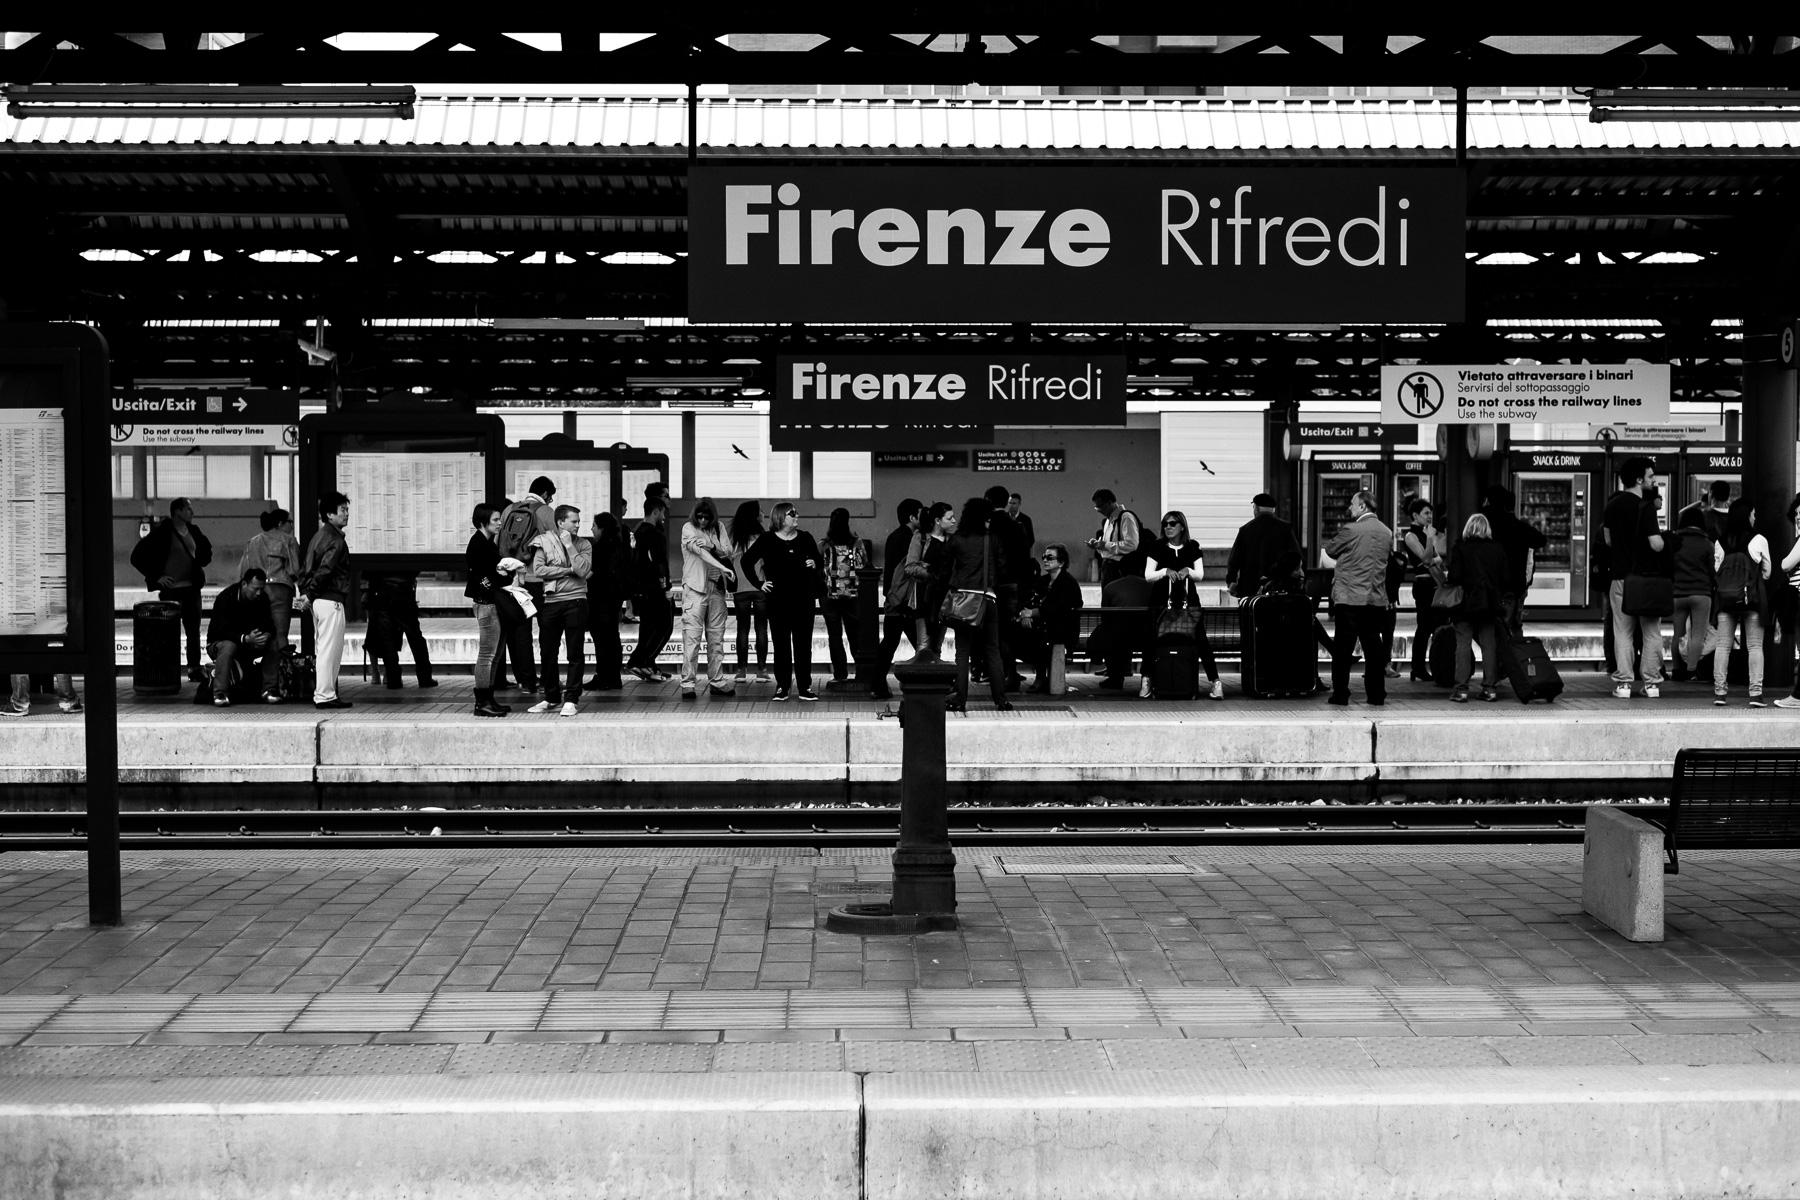 FirenzeStation.jpg